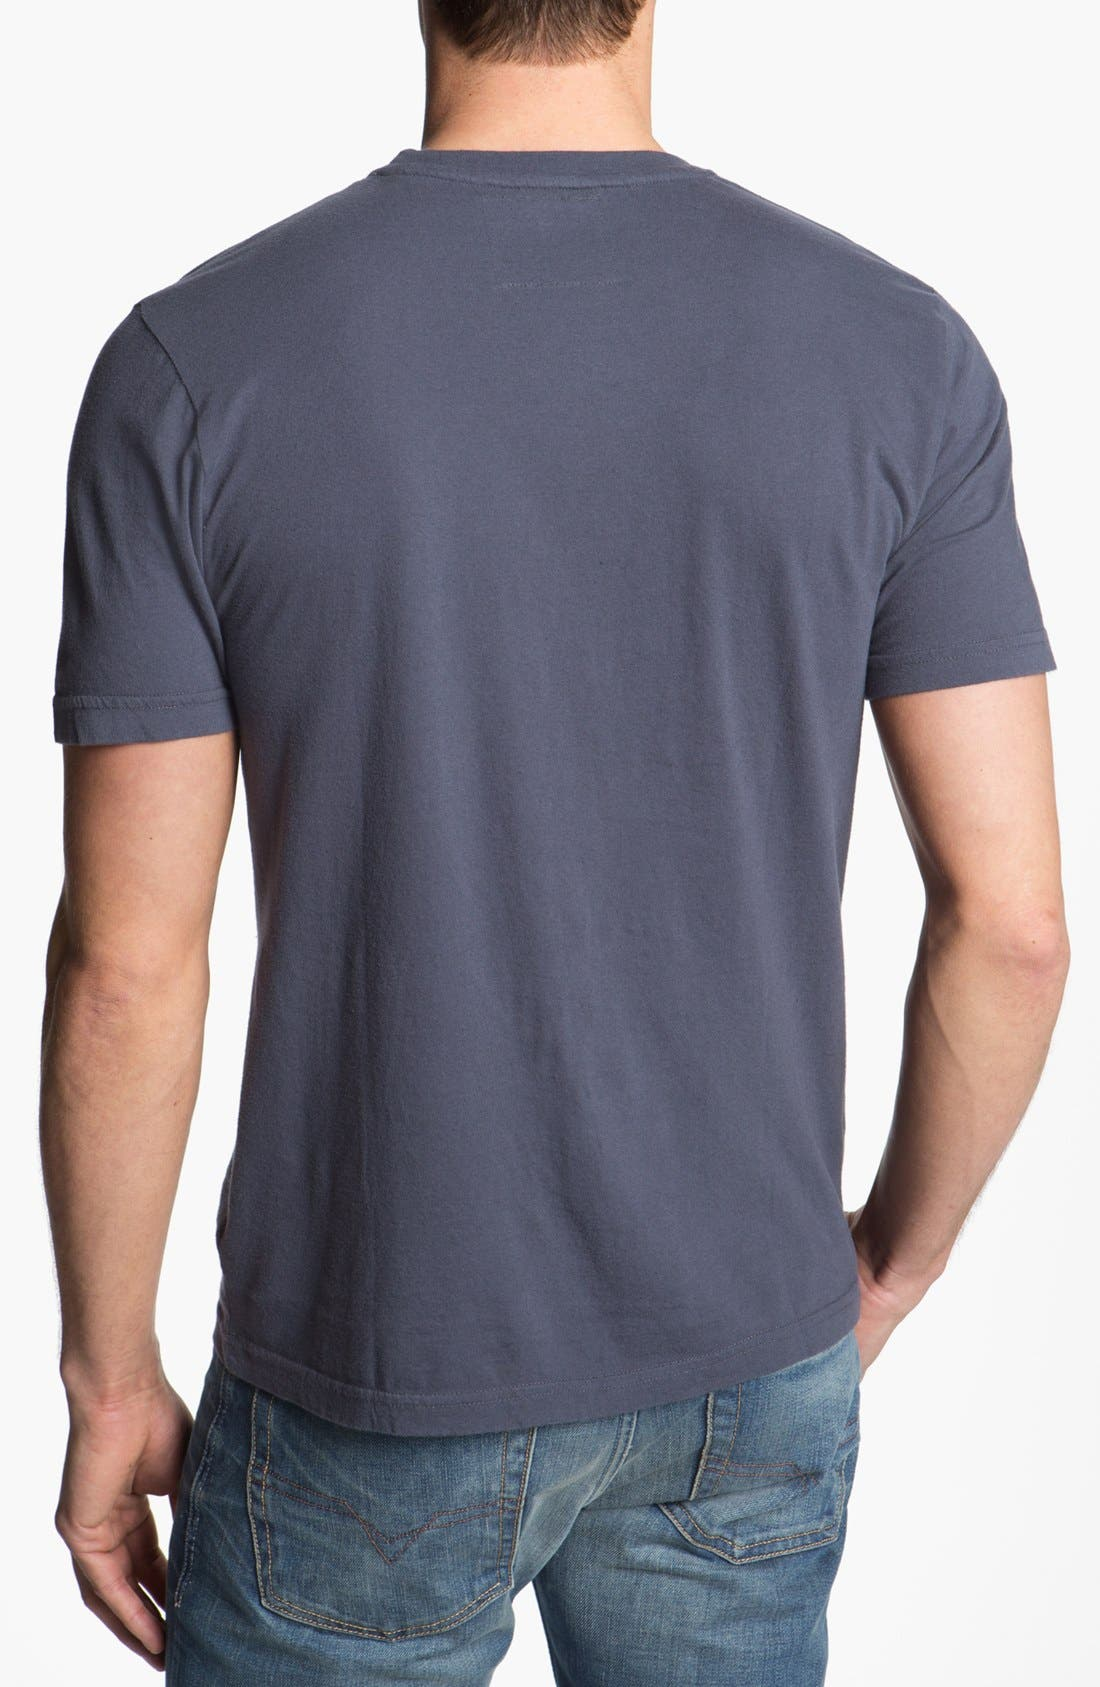 Alternate Image 2  - Red Jacket 'Surfing - Brass Tacks' T-Shirt